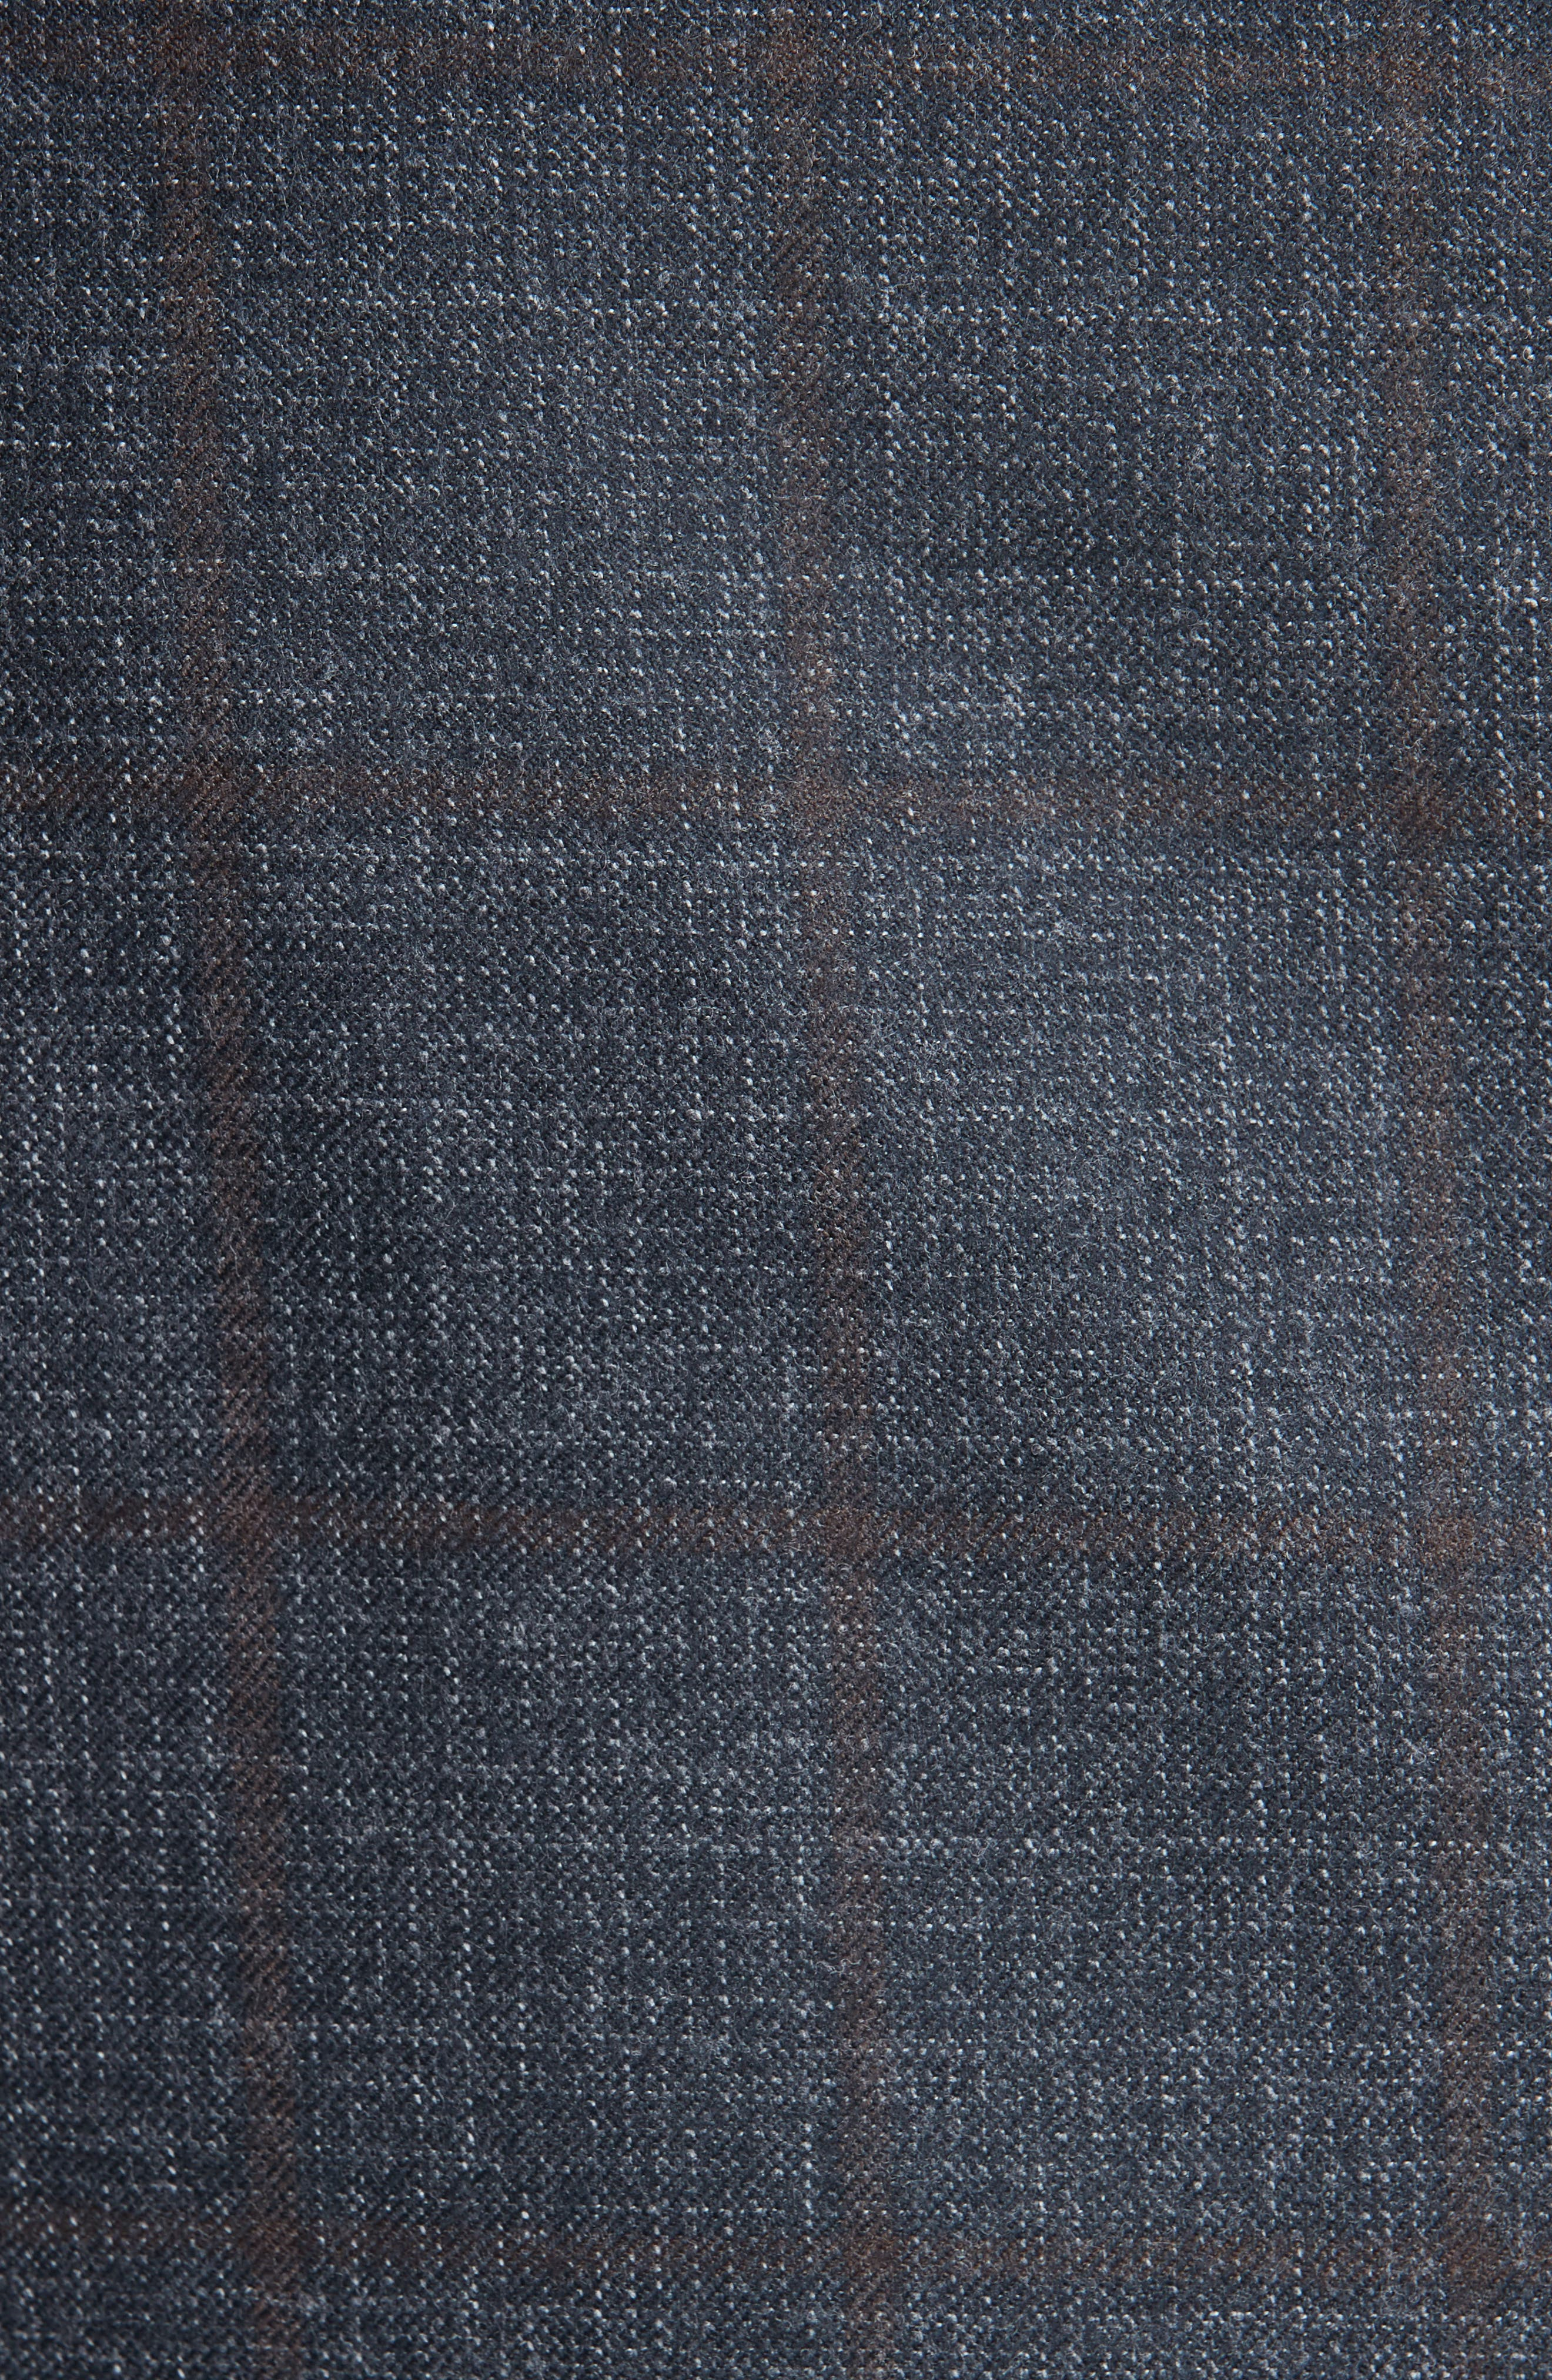 Classic Fit Plaid Wool Sport Coat,                             Alternate thumbnail 6, color,                             CHARCOAL